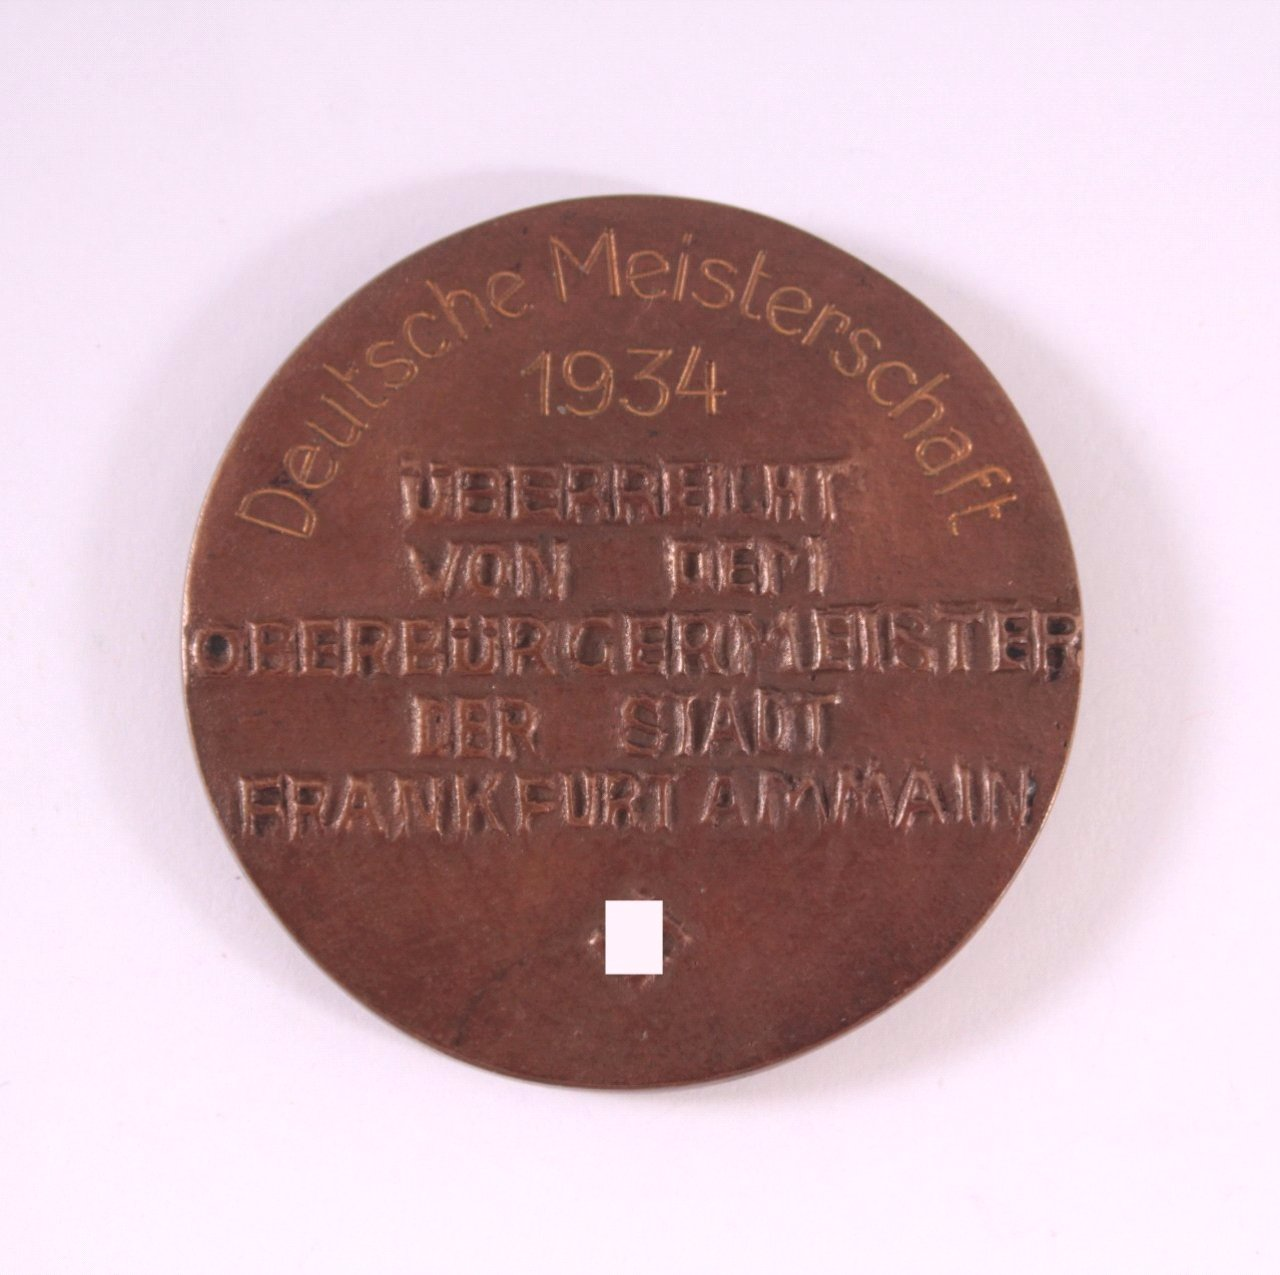 Bronze Medaille, Stark im Recht, Frankfurt 1934-1